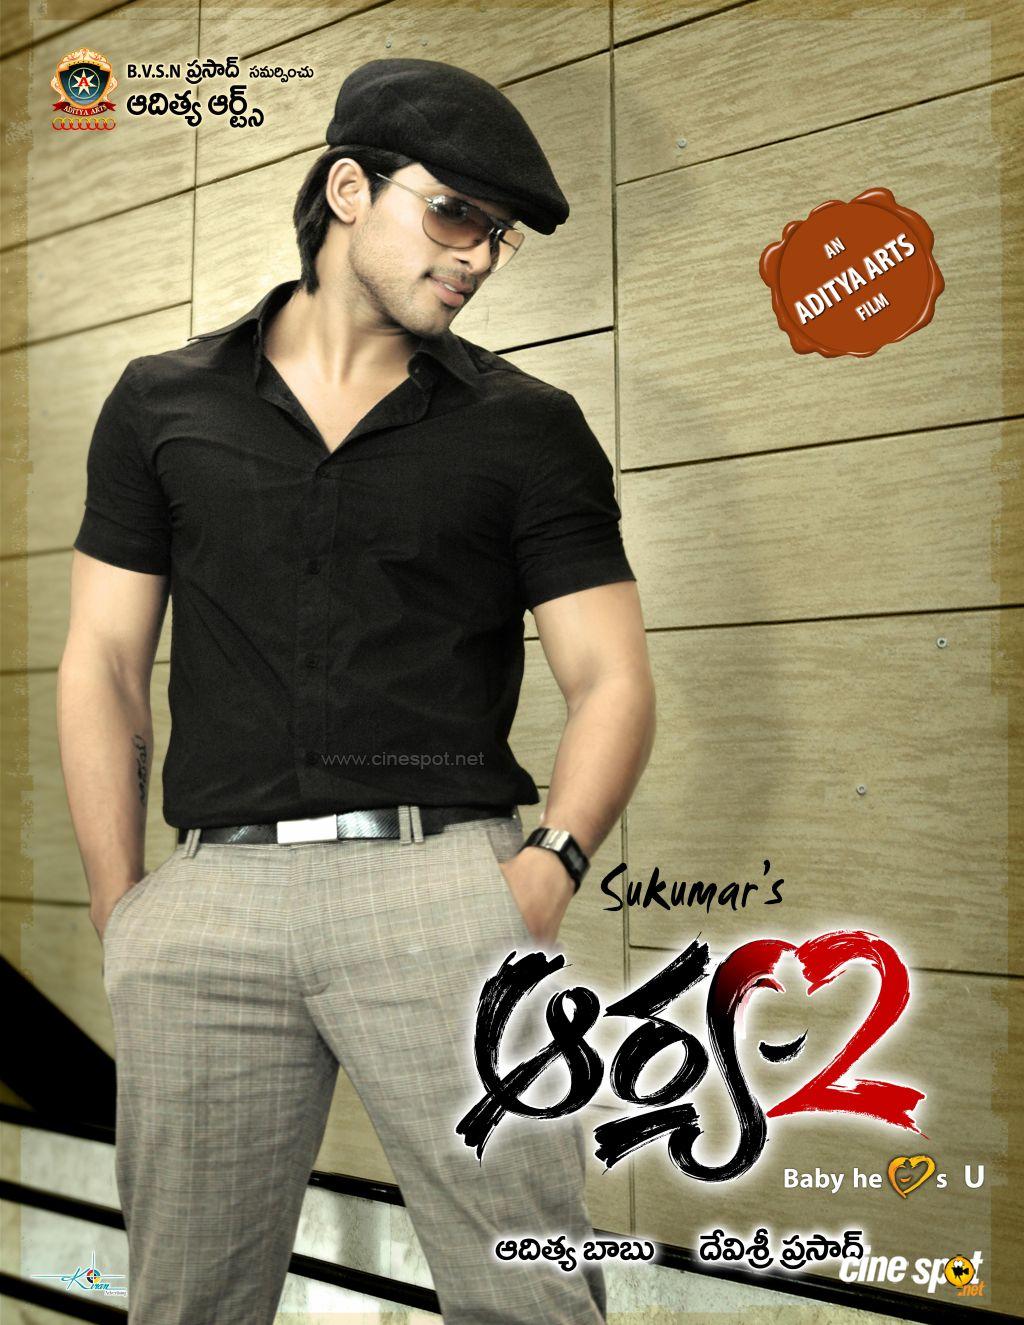 http://4.bp.blogspot.com/_RjsoY7kkj8k/TCeOkmdUcXI/AAAAAAAABbE/KAqVPZqk5Uc/s1600/Aarya2+Telugu+Movie+Wallpapers+_6_.jpg